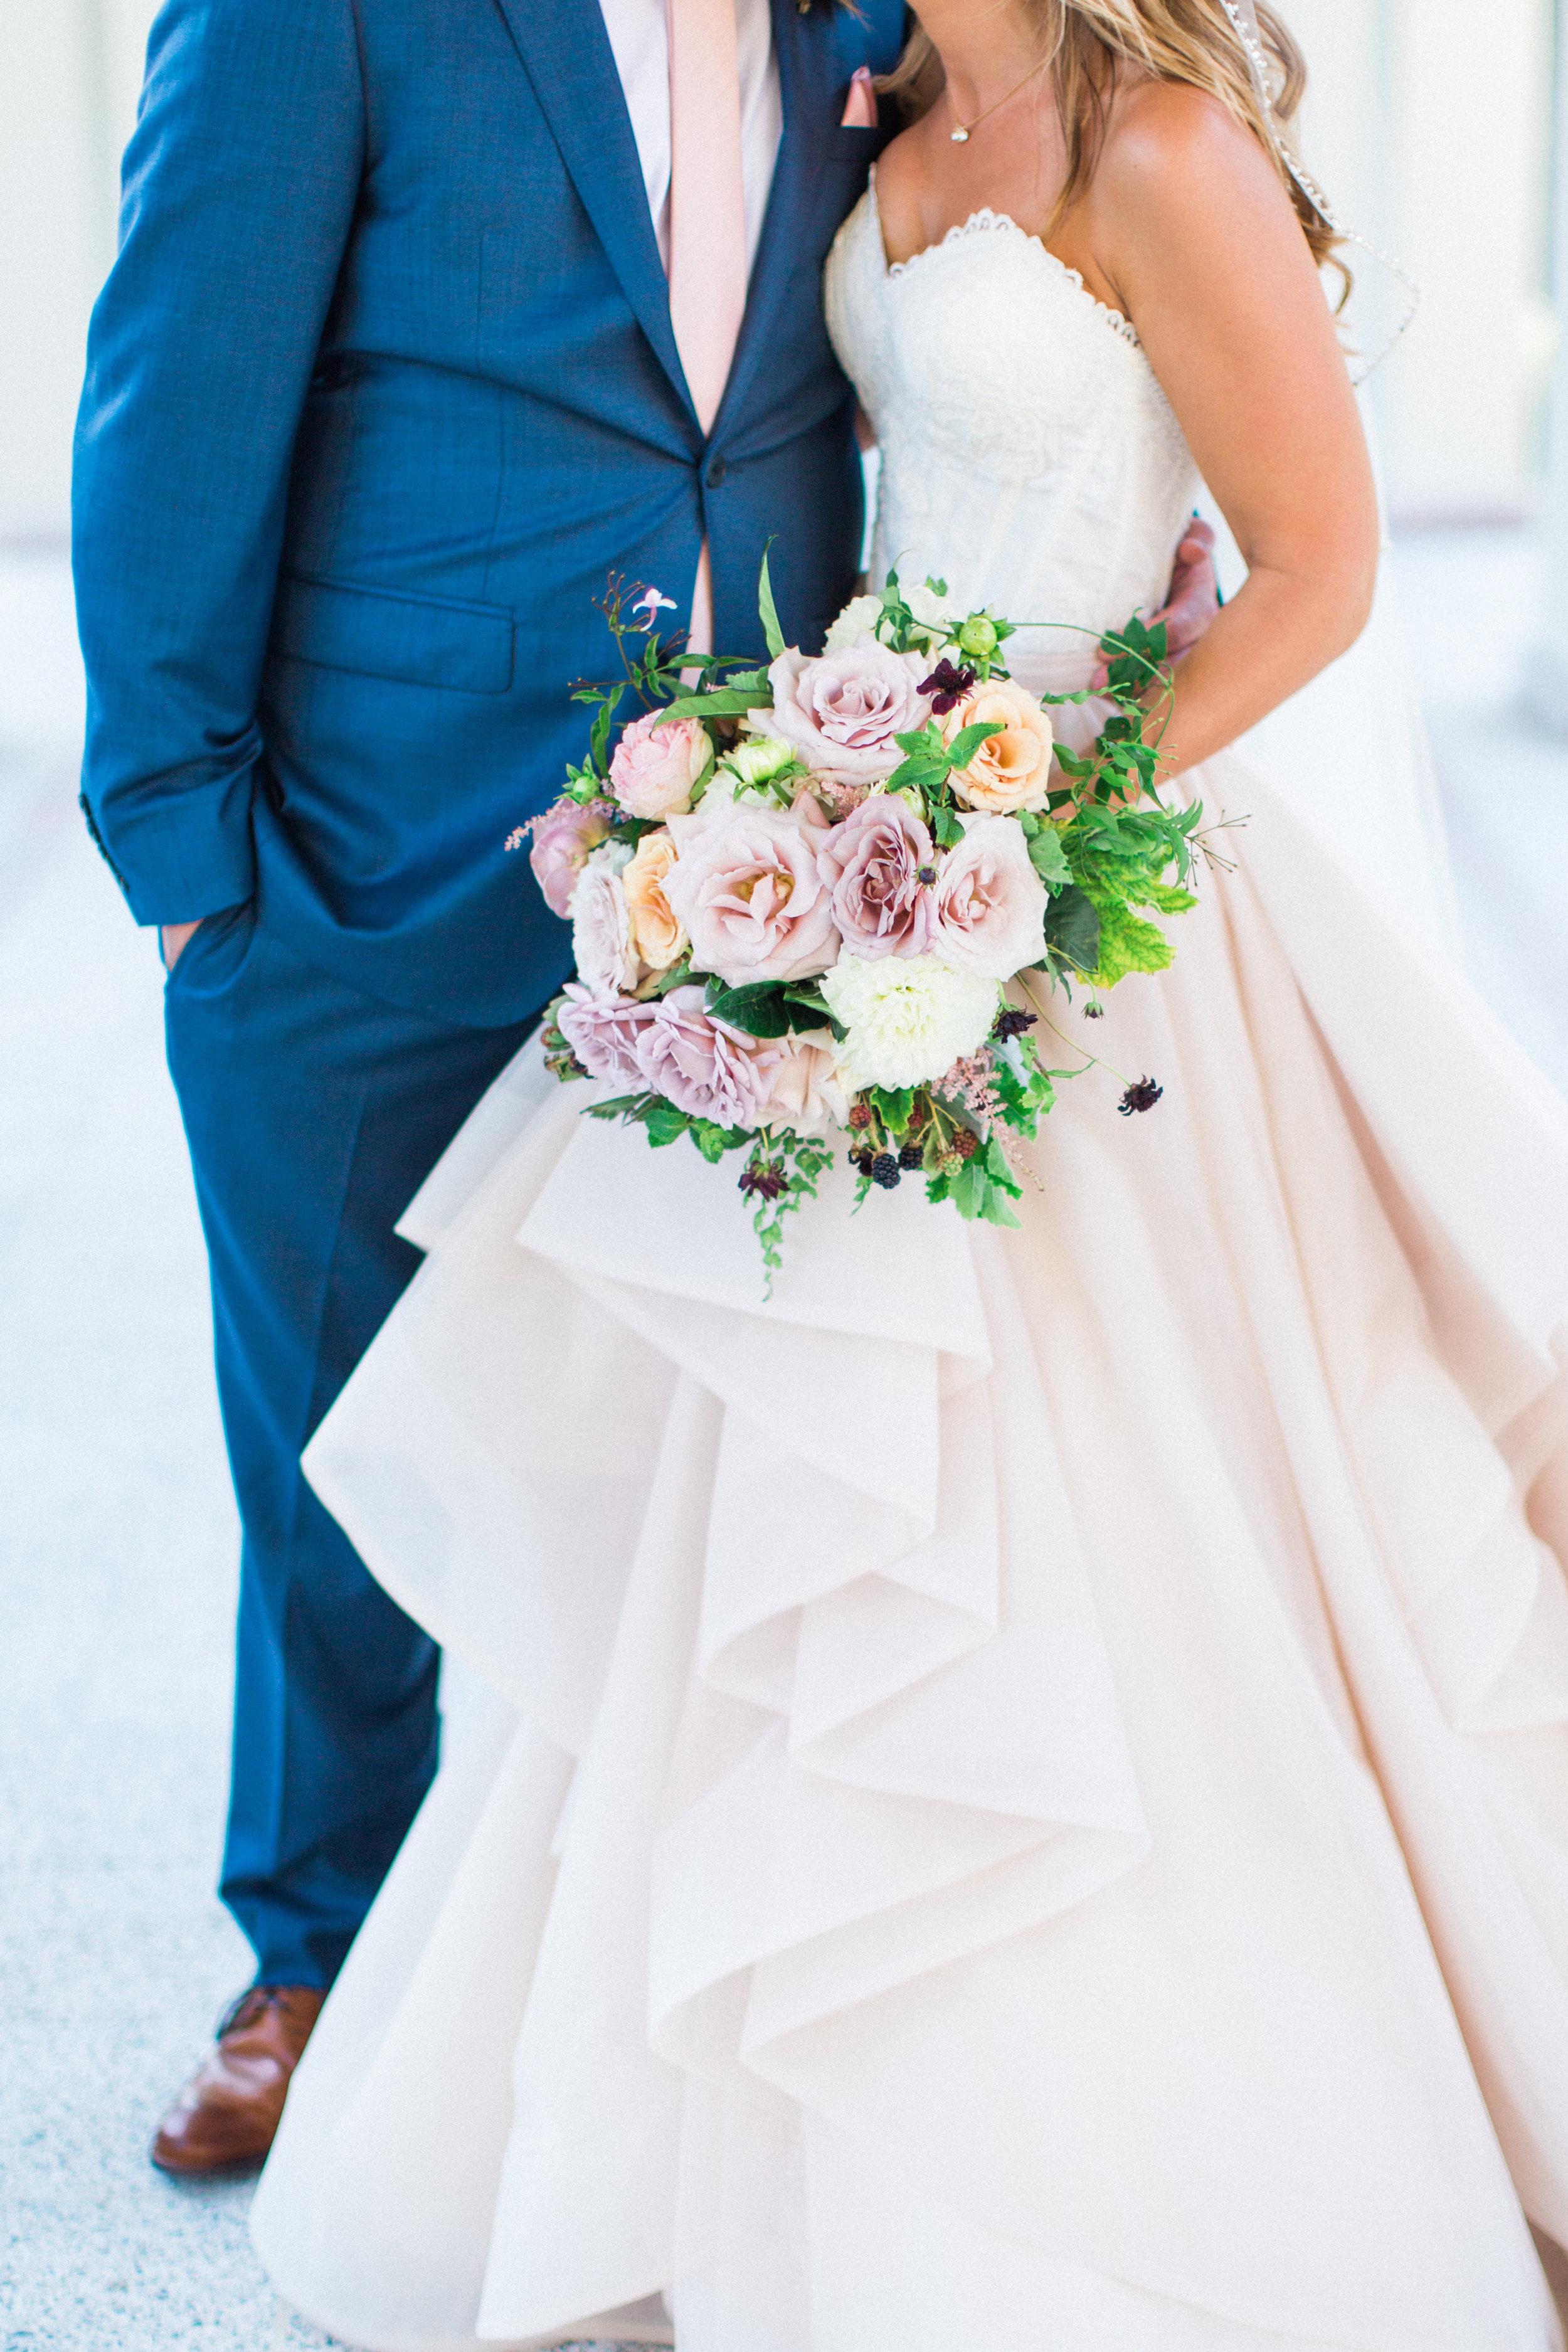 Blooms-breesa-lee-luxury-florist-aga-jones-tres-chic-affairs-san-diego-wedding-classic-coast-catering-(31).jpg